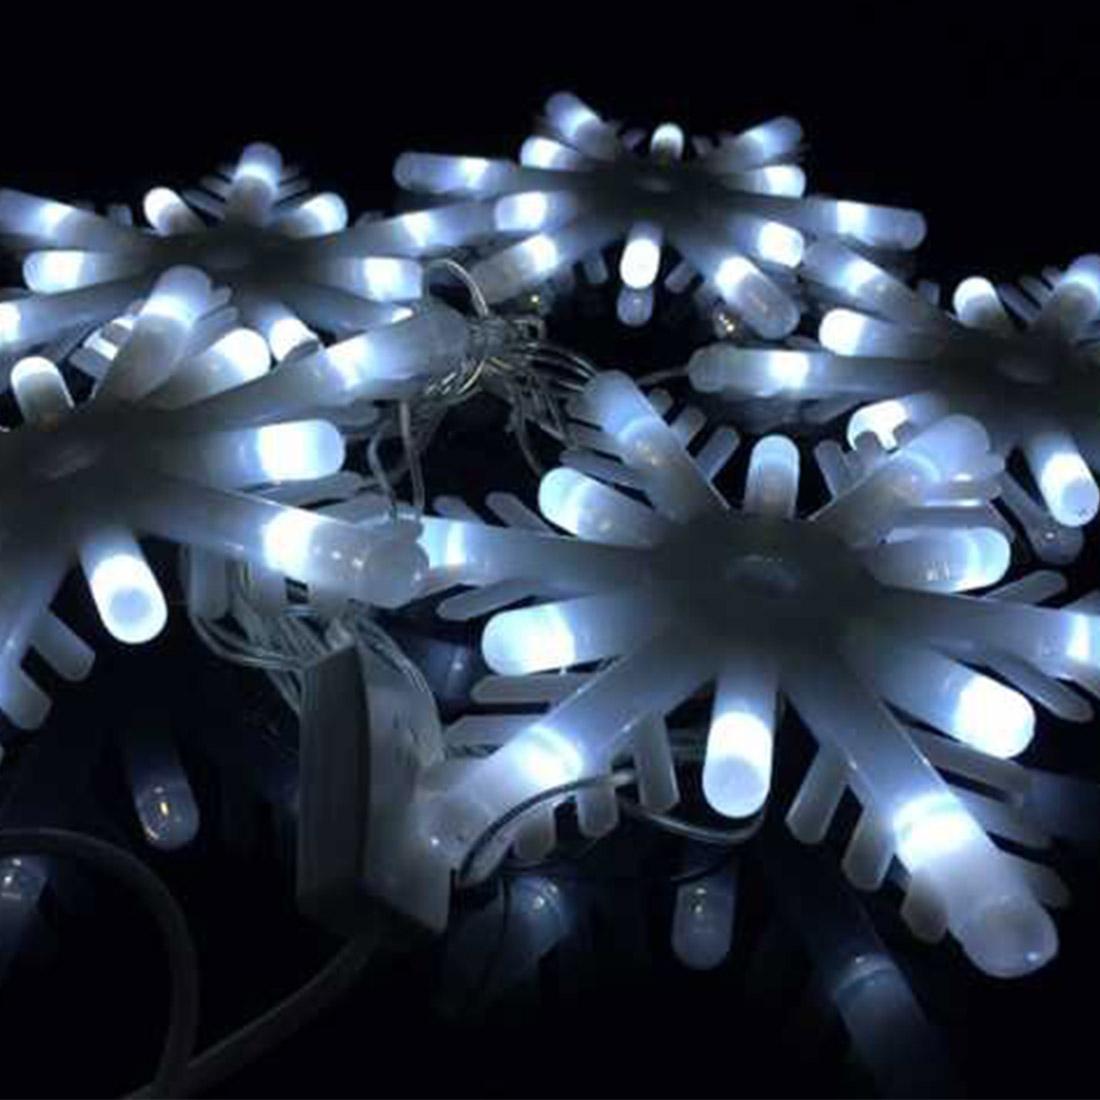 Christmas Wedding Party Garden 2.5M 5LED Decoration Light Cream White Snowflakes LED String Ligh Party Decoration(China (Mainland))